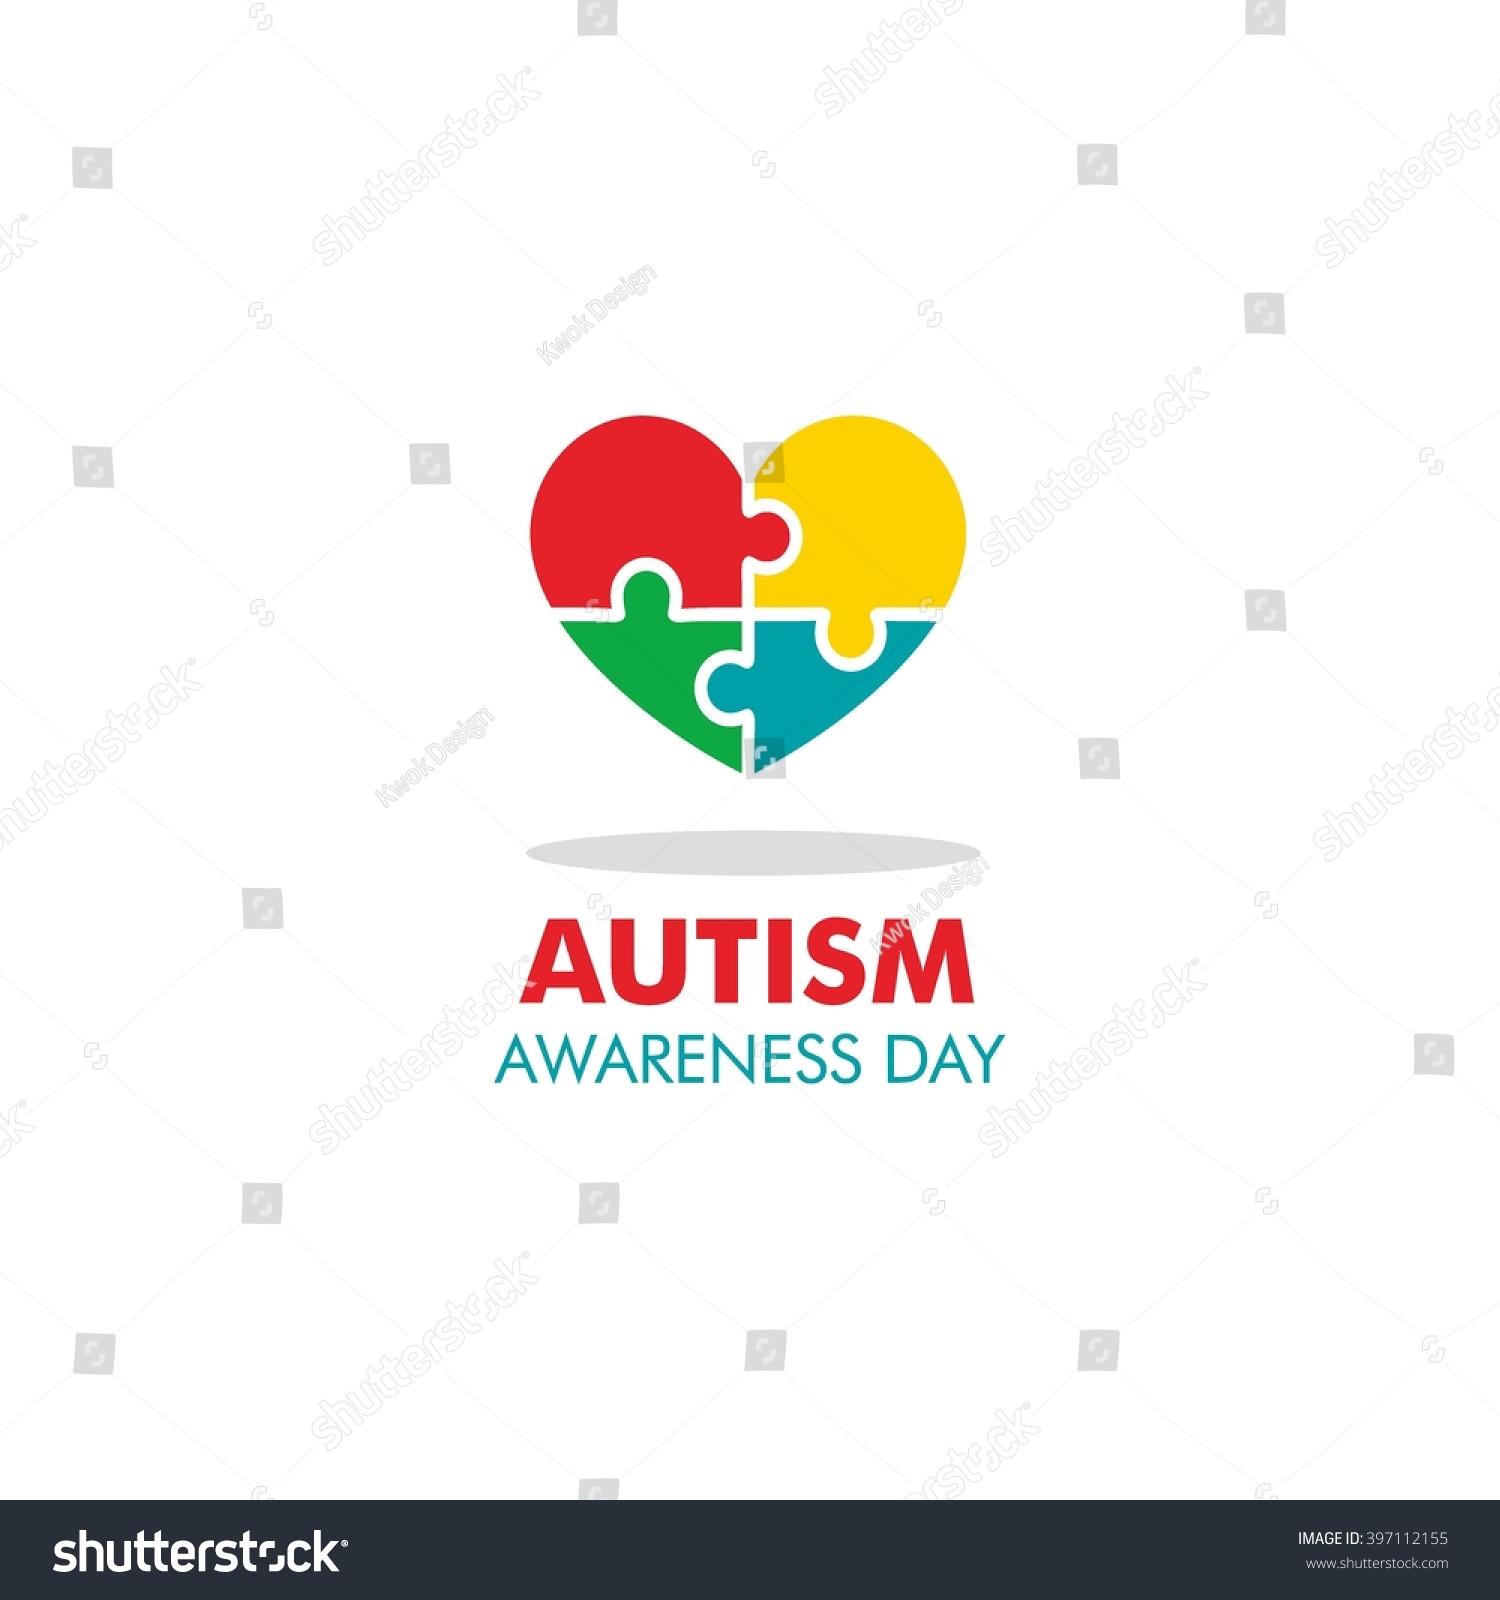 World autism awareness day logo design stock vector 397112155 world autism awareness day logo design template vector illustration colorful puzzles symbol biocorpaavc